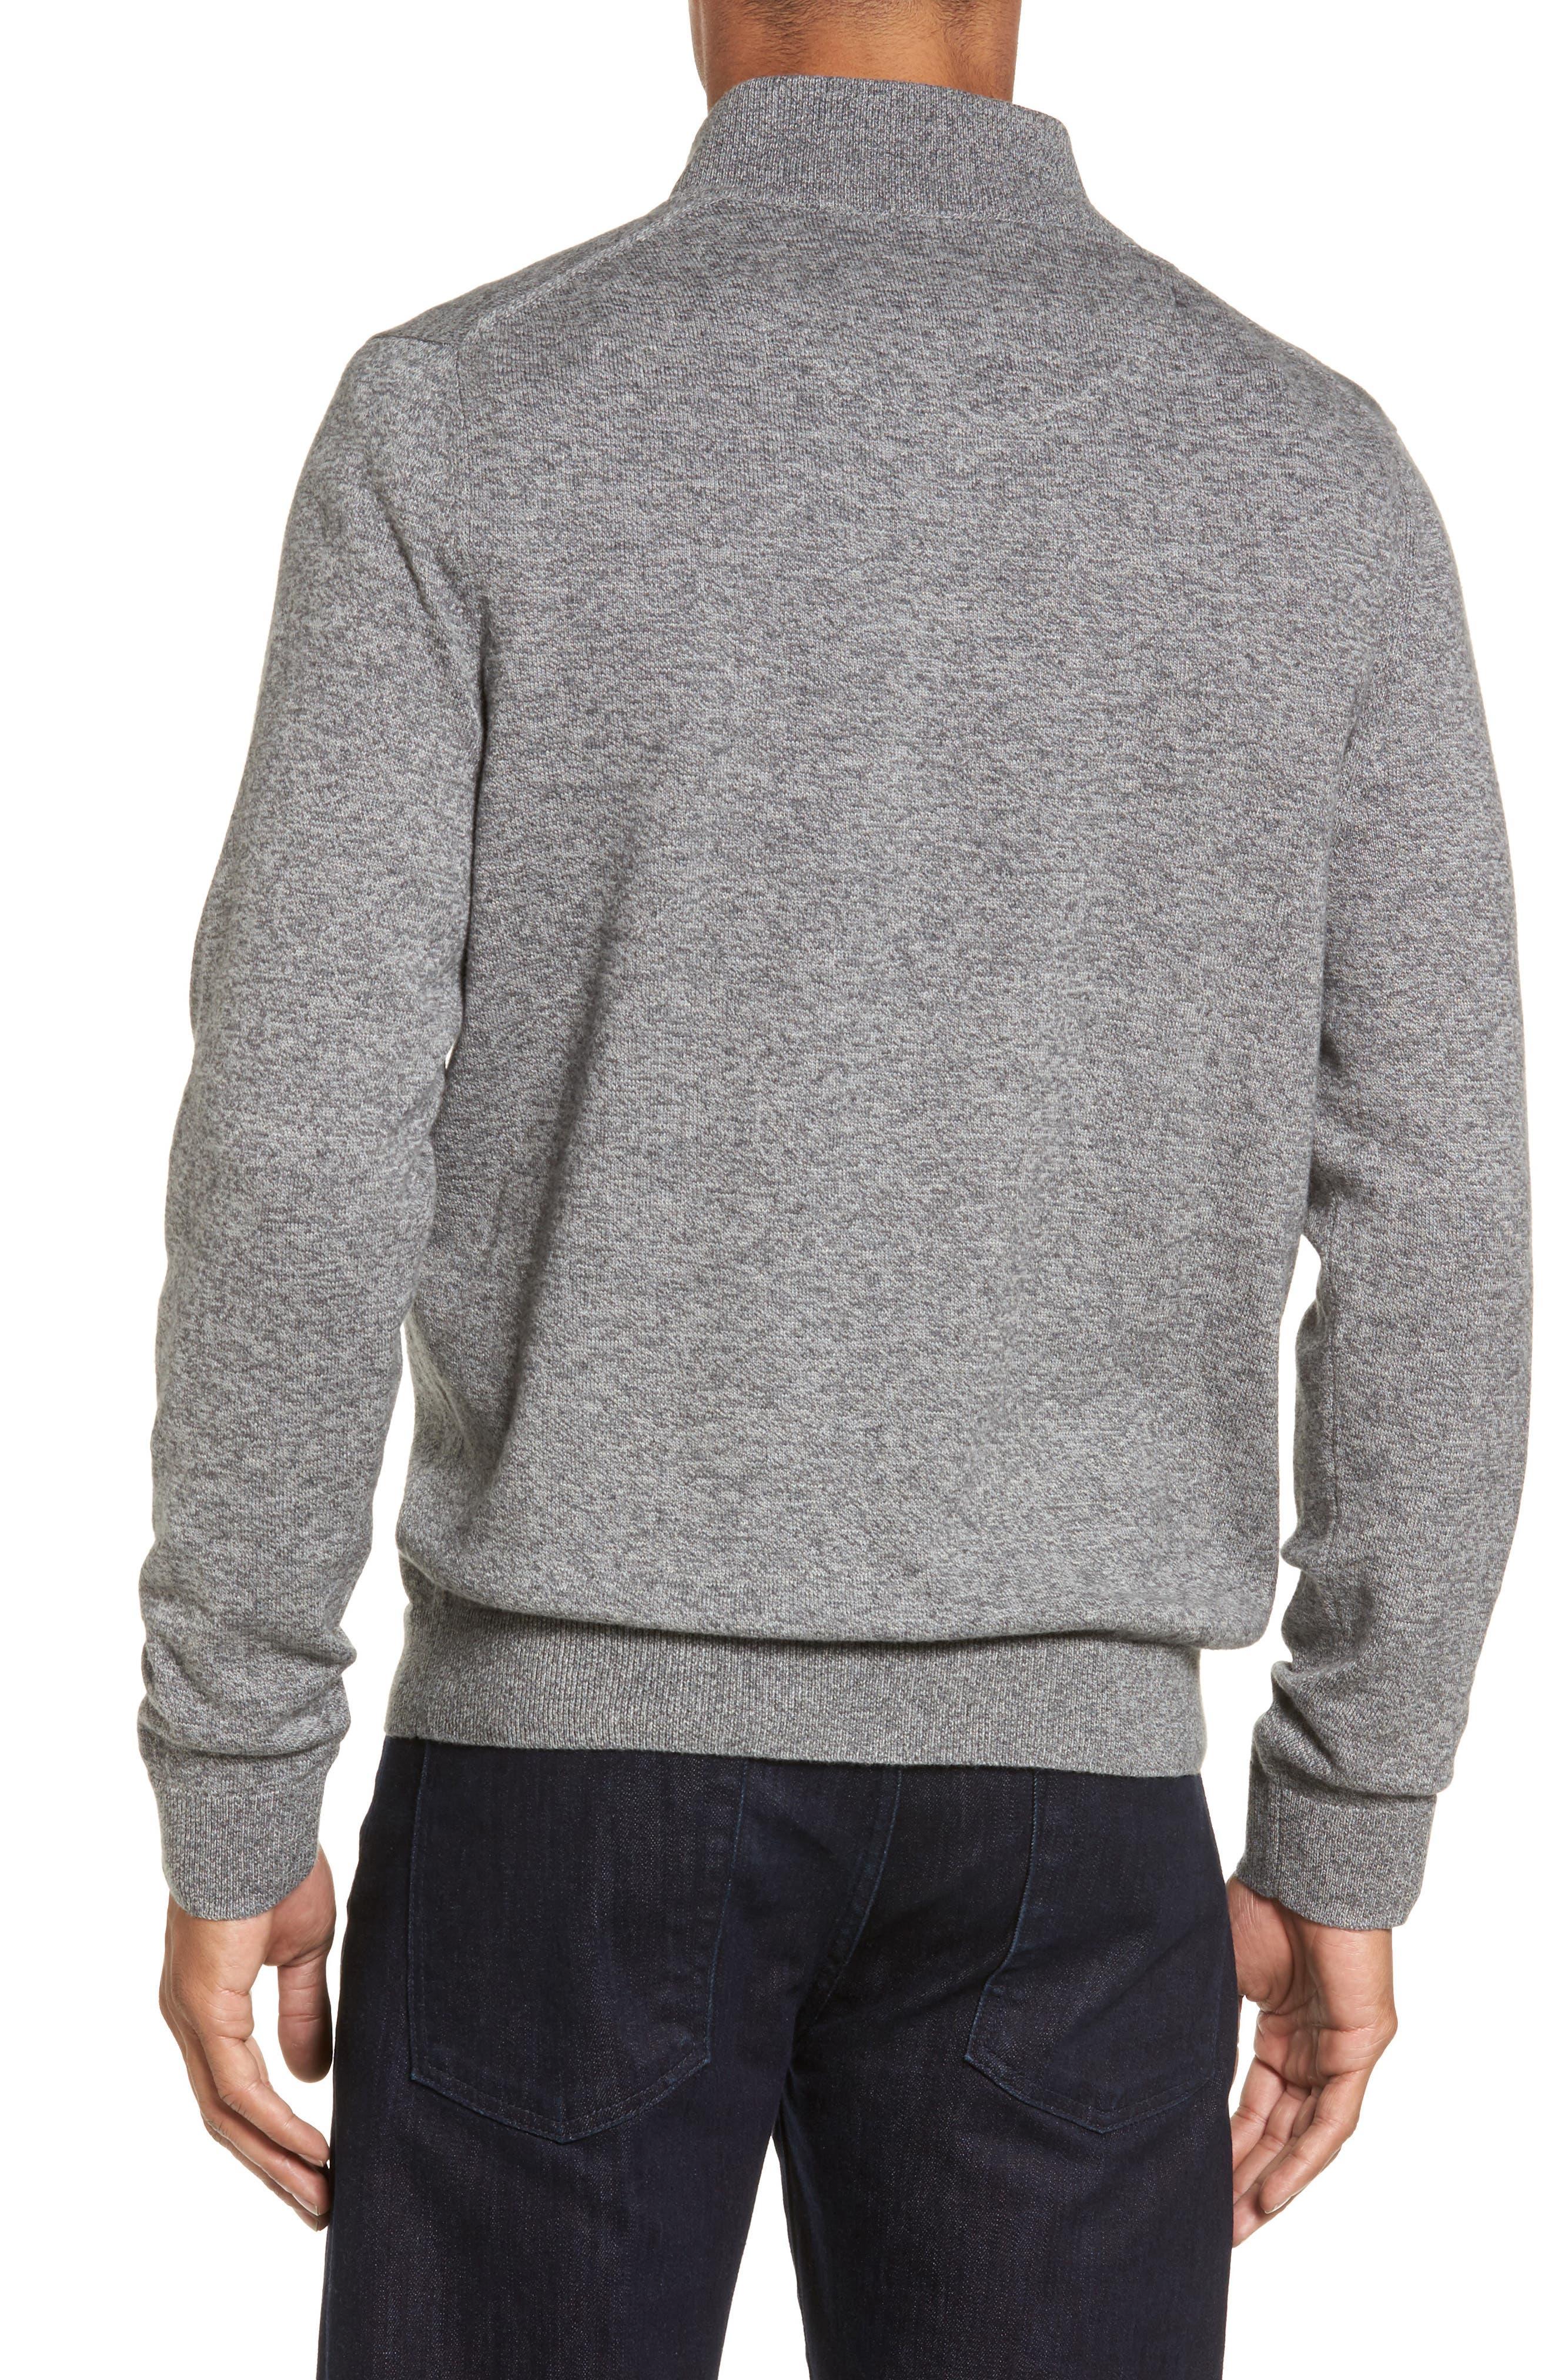 Alternate Image 2  - Nordstrom Men's Shop Quarter Zip Sweater (Big)